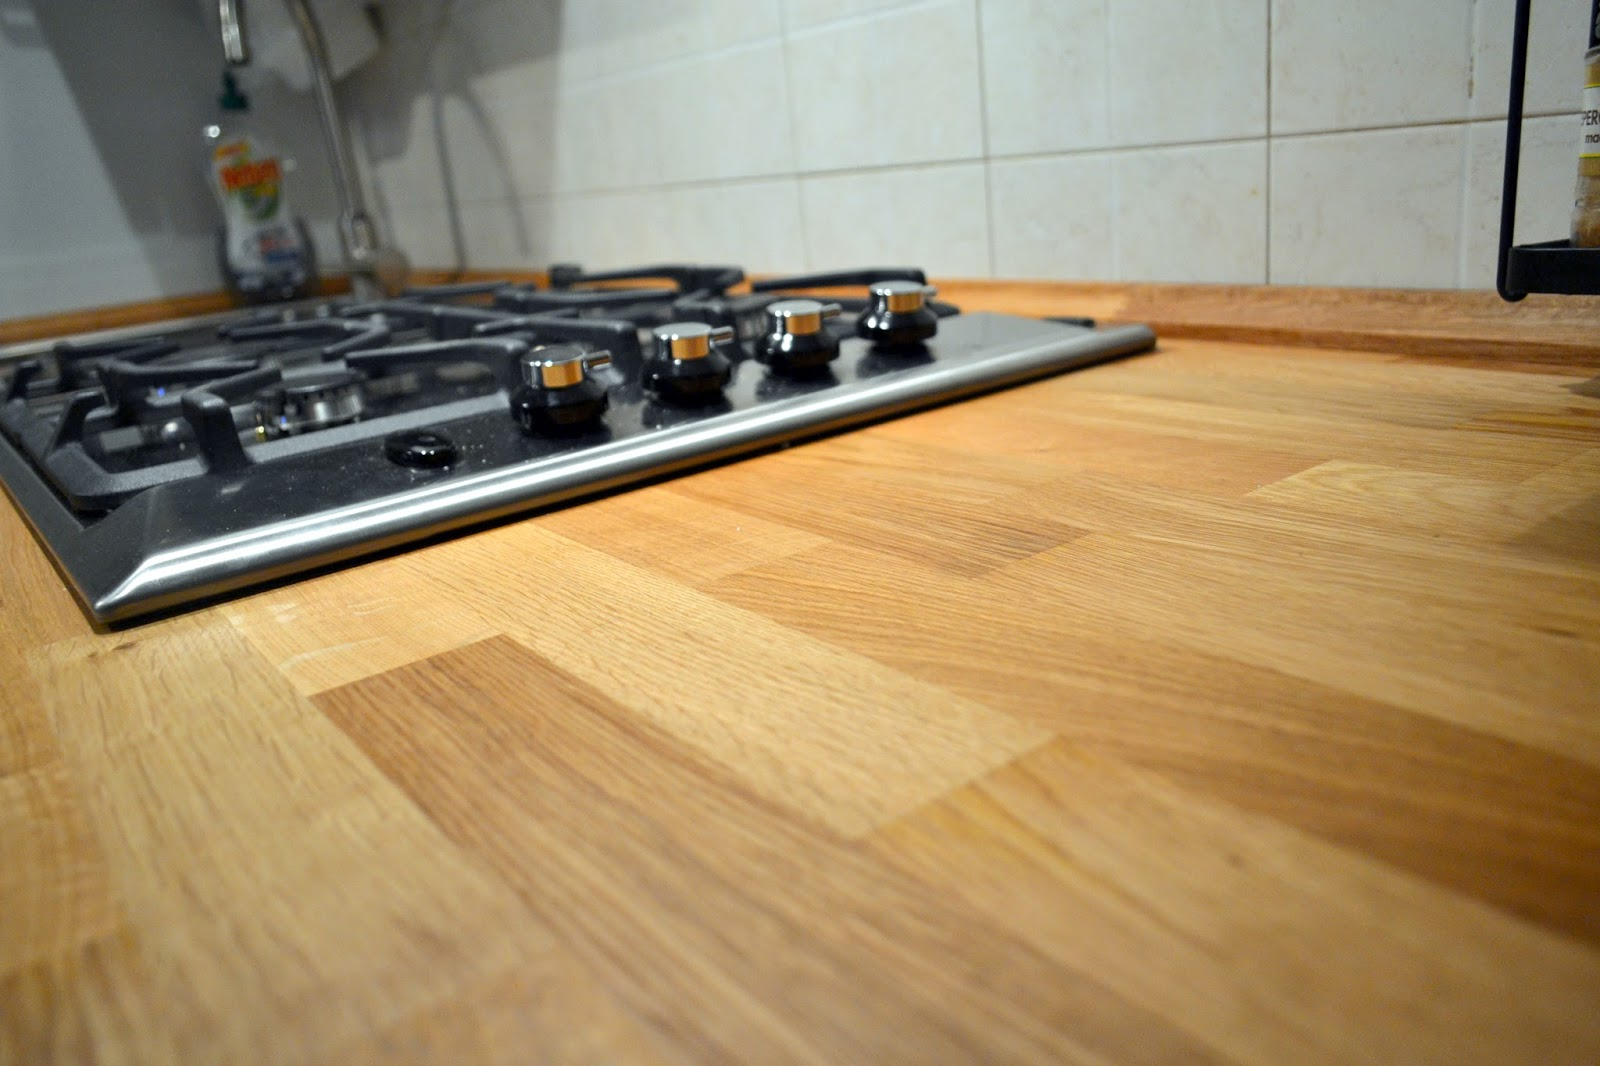 Amazing Ikea Mobili Cucina Su Misura Pics ...